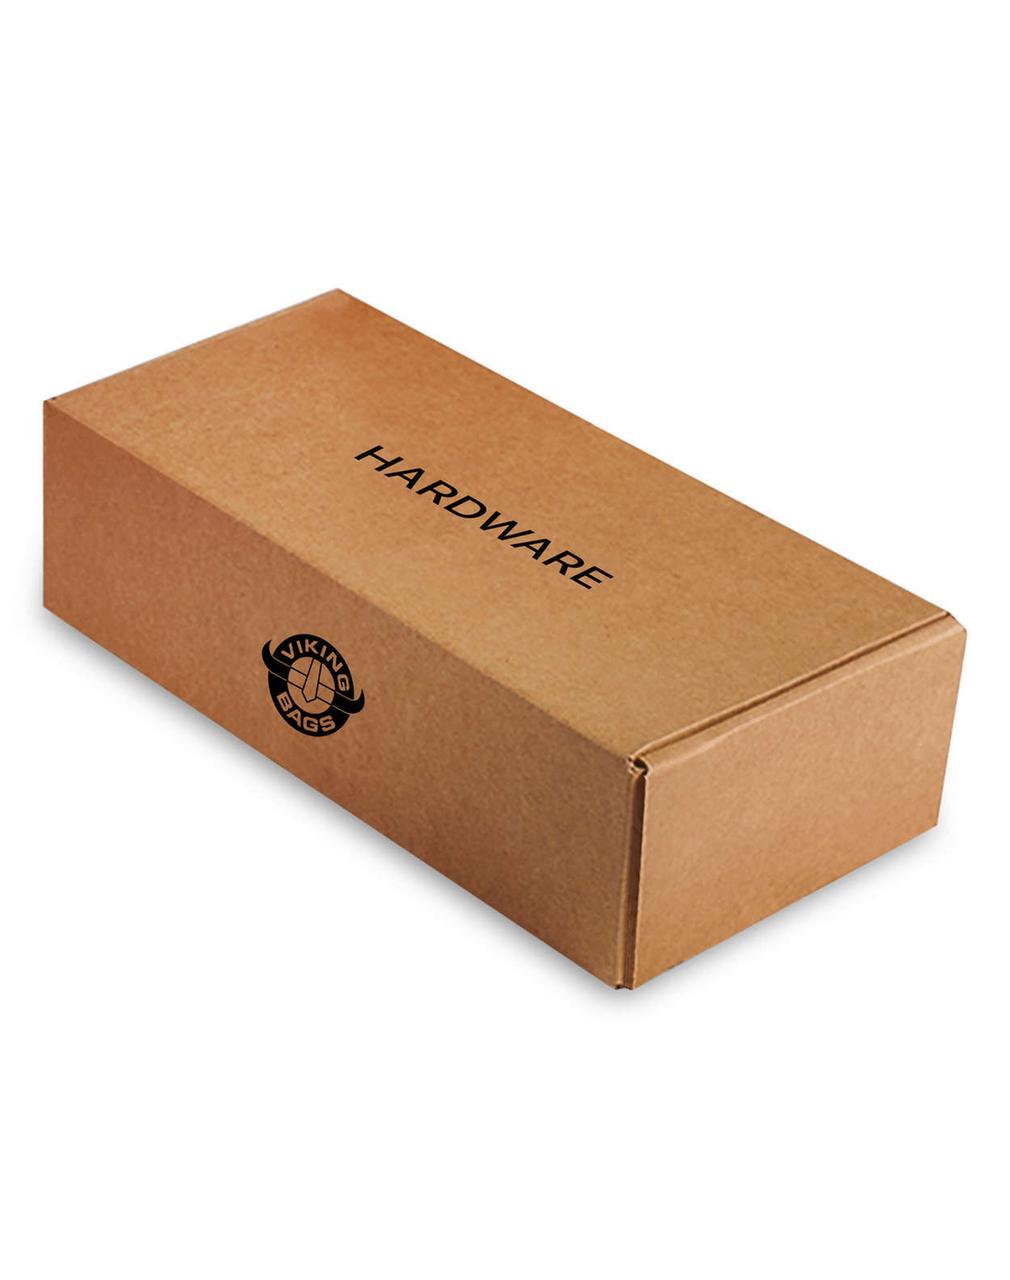 Honda Rebel 500 Shock Shock Cutout Slanted Large Motorcycle Saddlebags Hardware Box